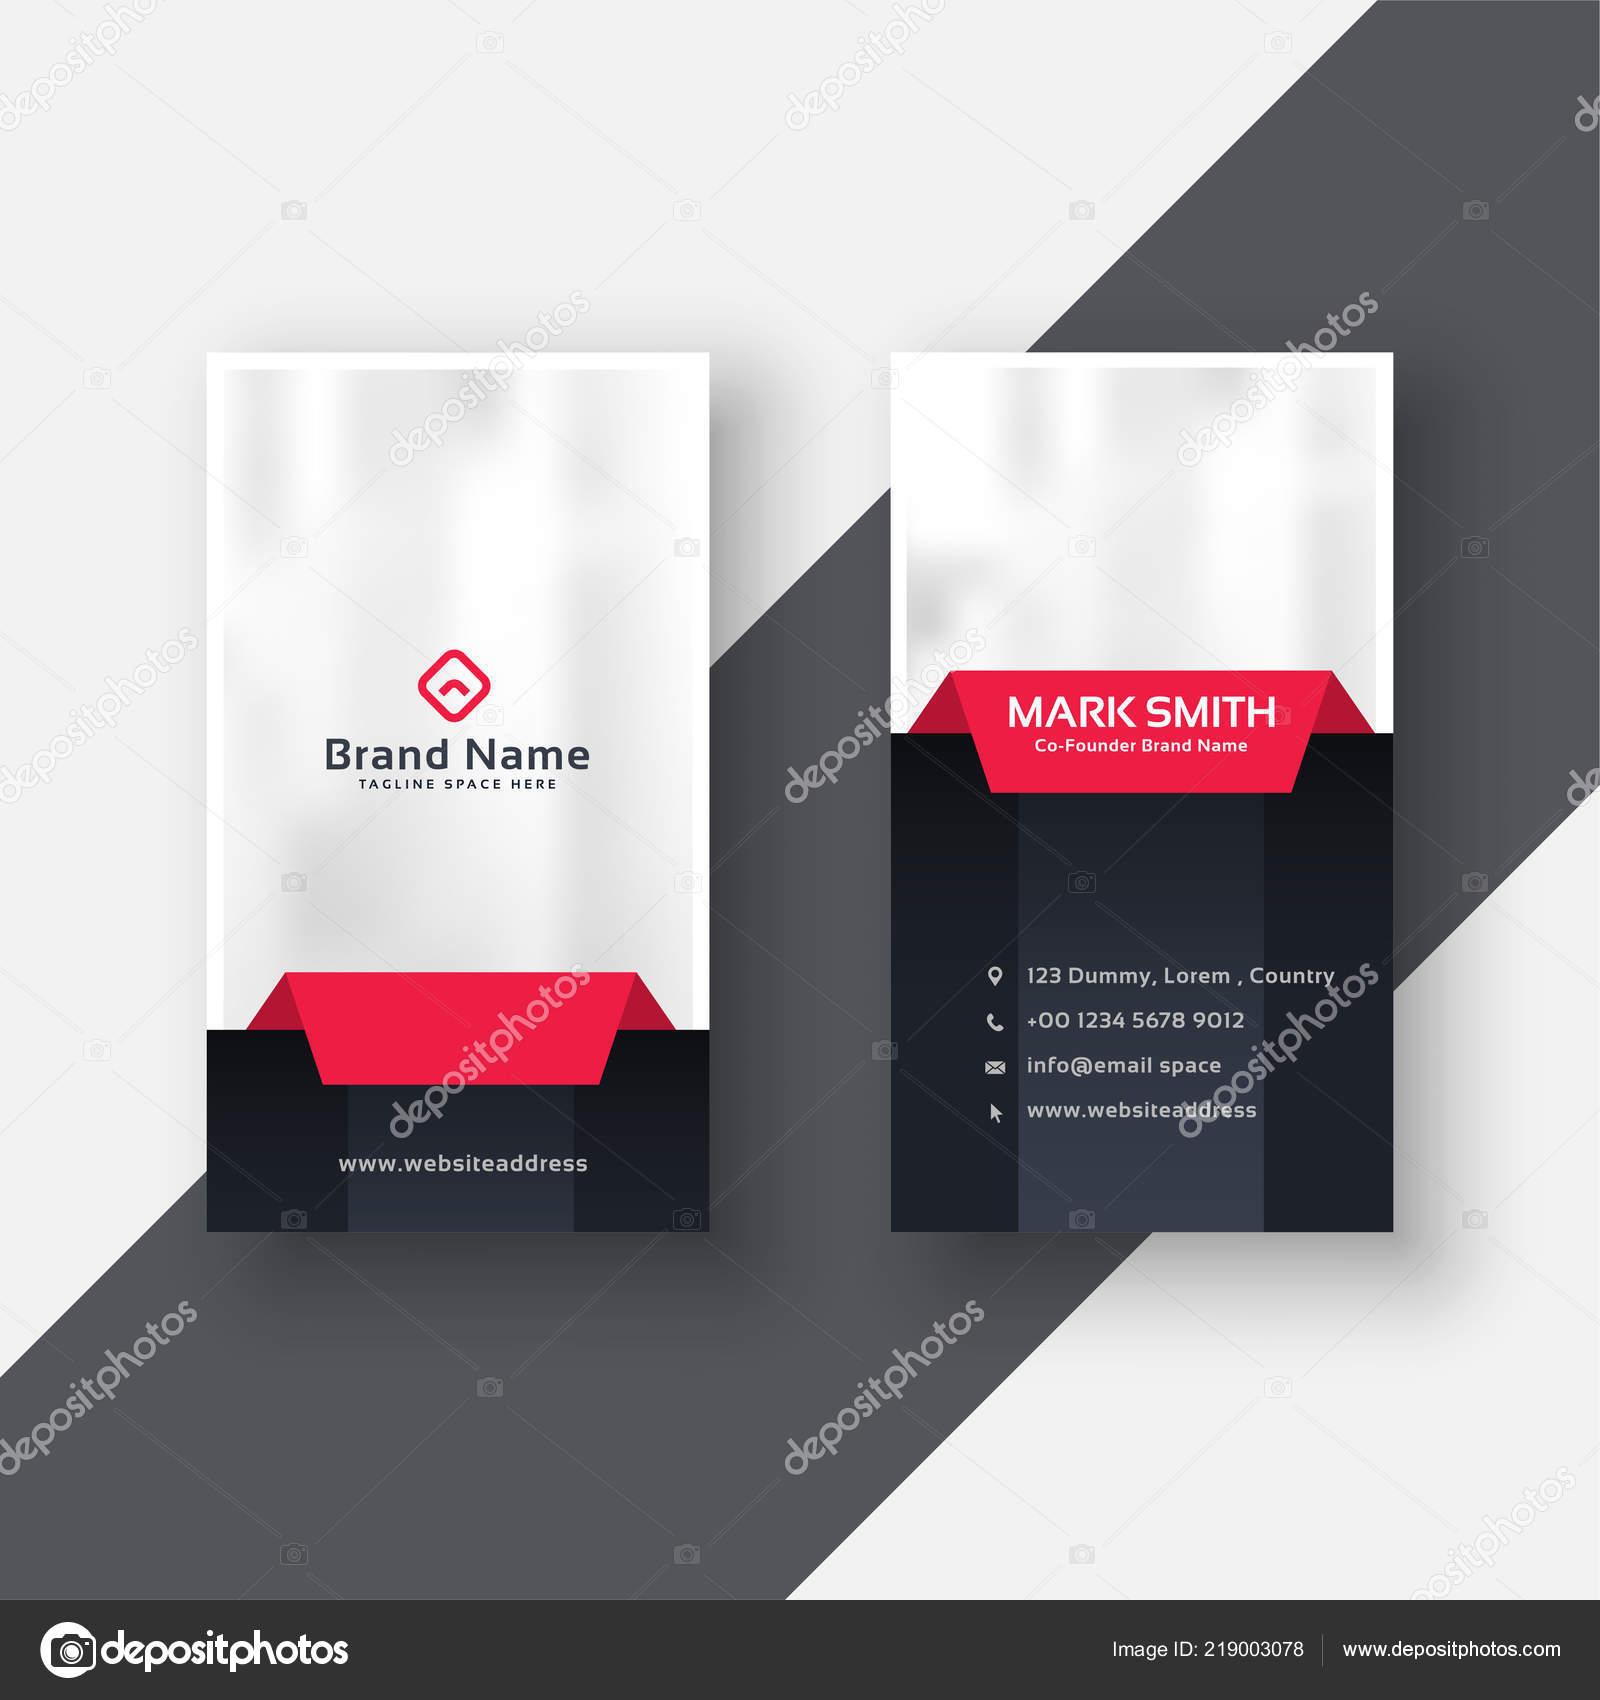 Professionelle Vertikale Visitenkarten Modernes Design Rot